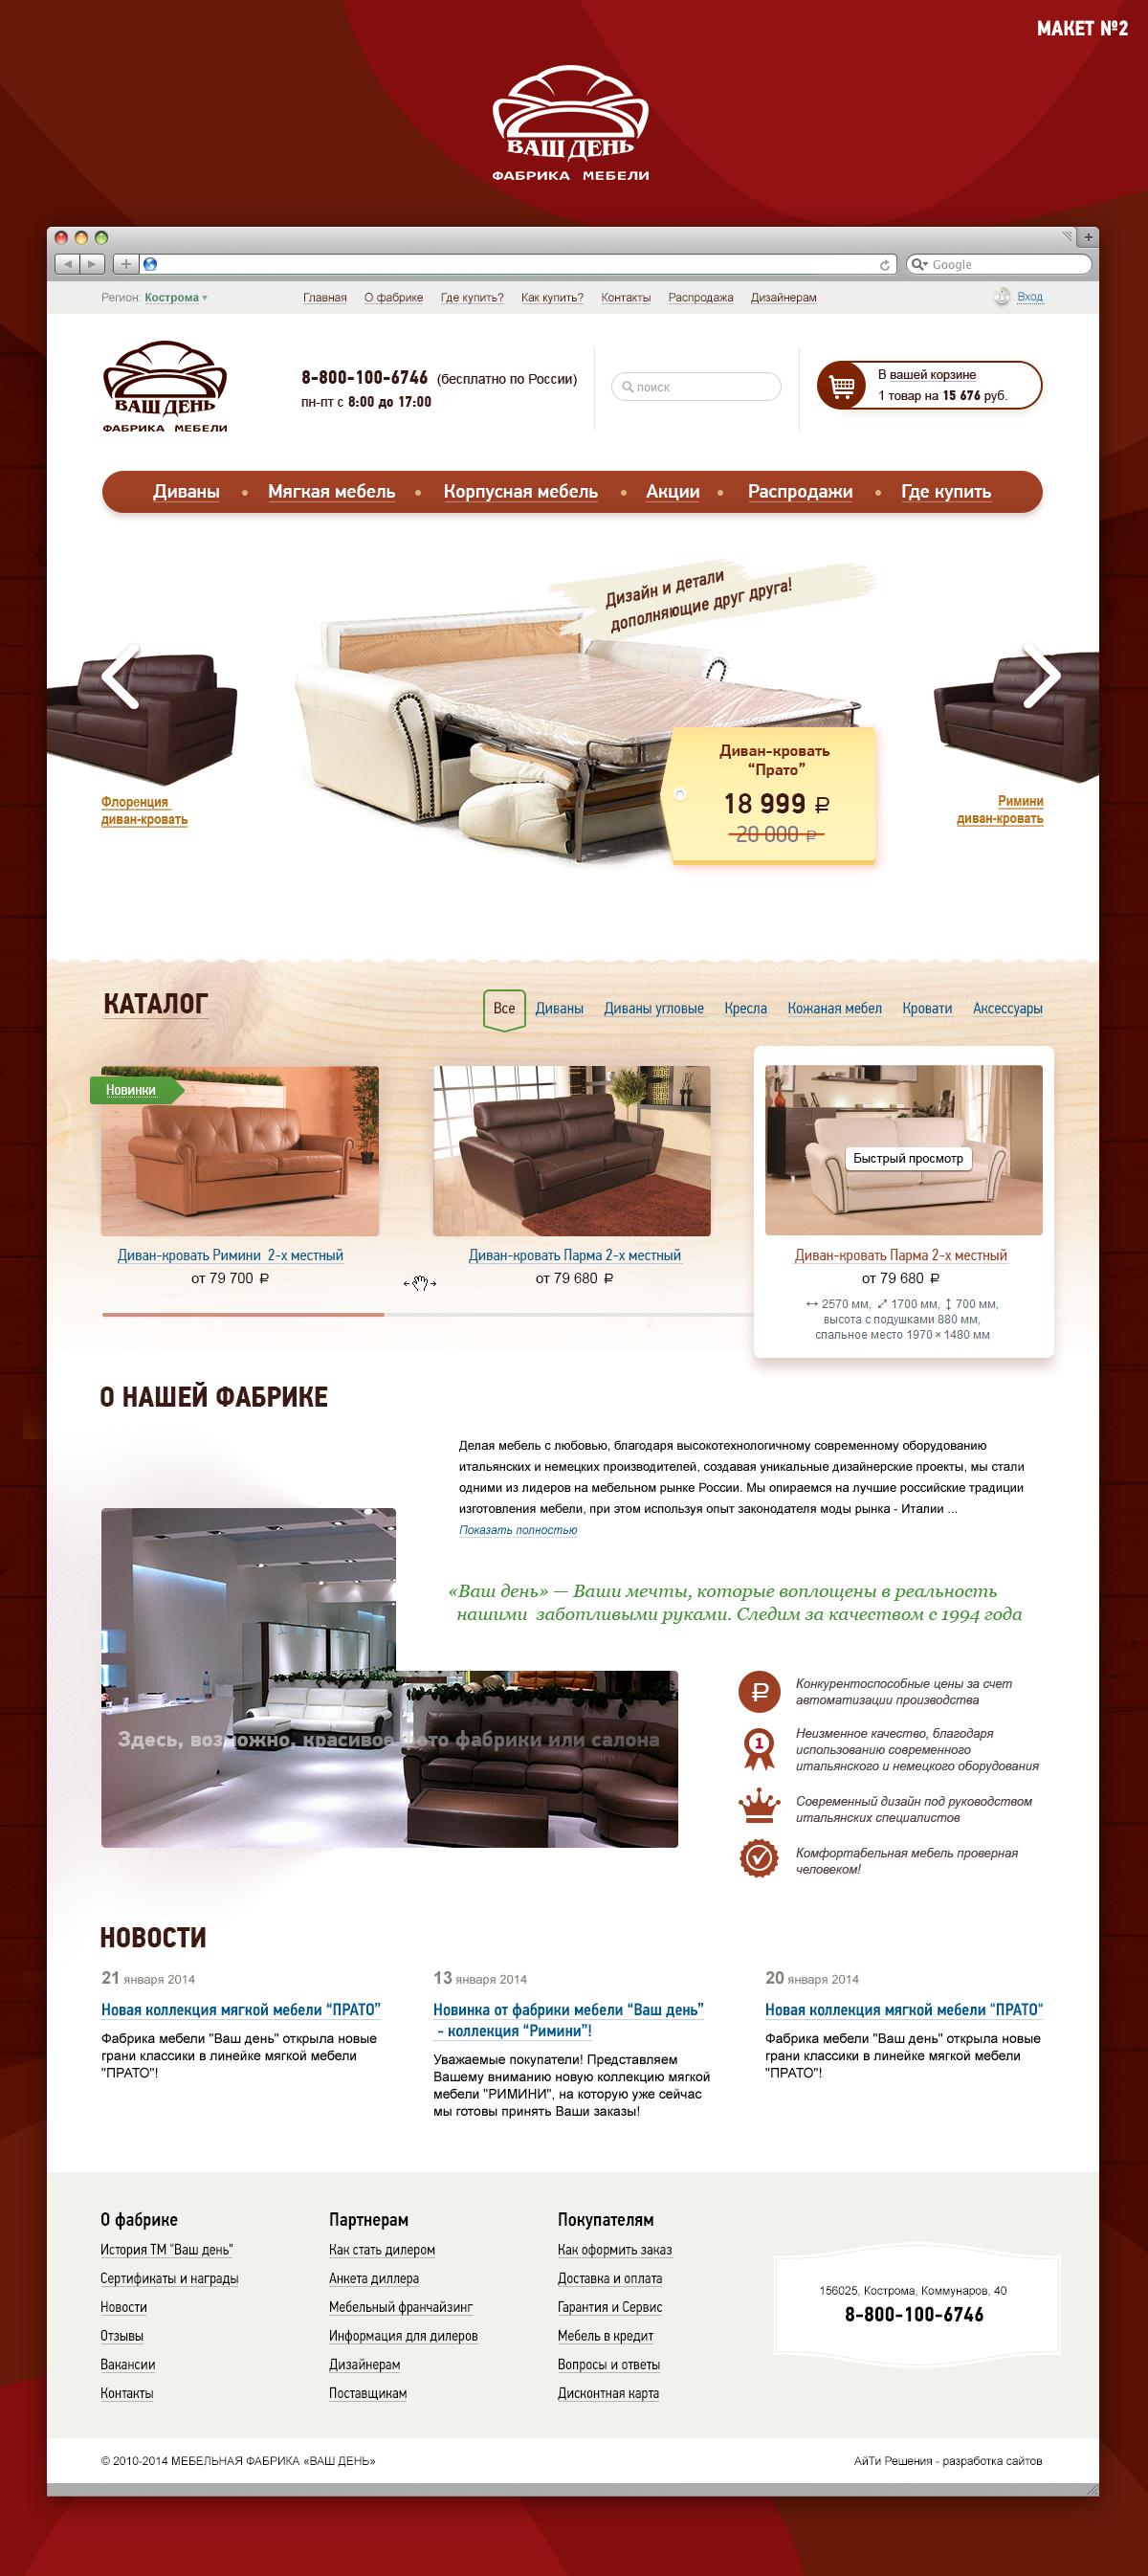 Разработать дизайн для интернет-магазина мебели фото f_87852e7763075bd8.png